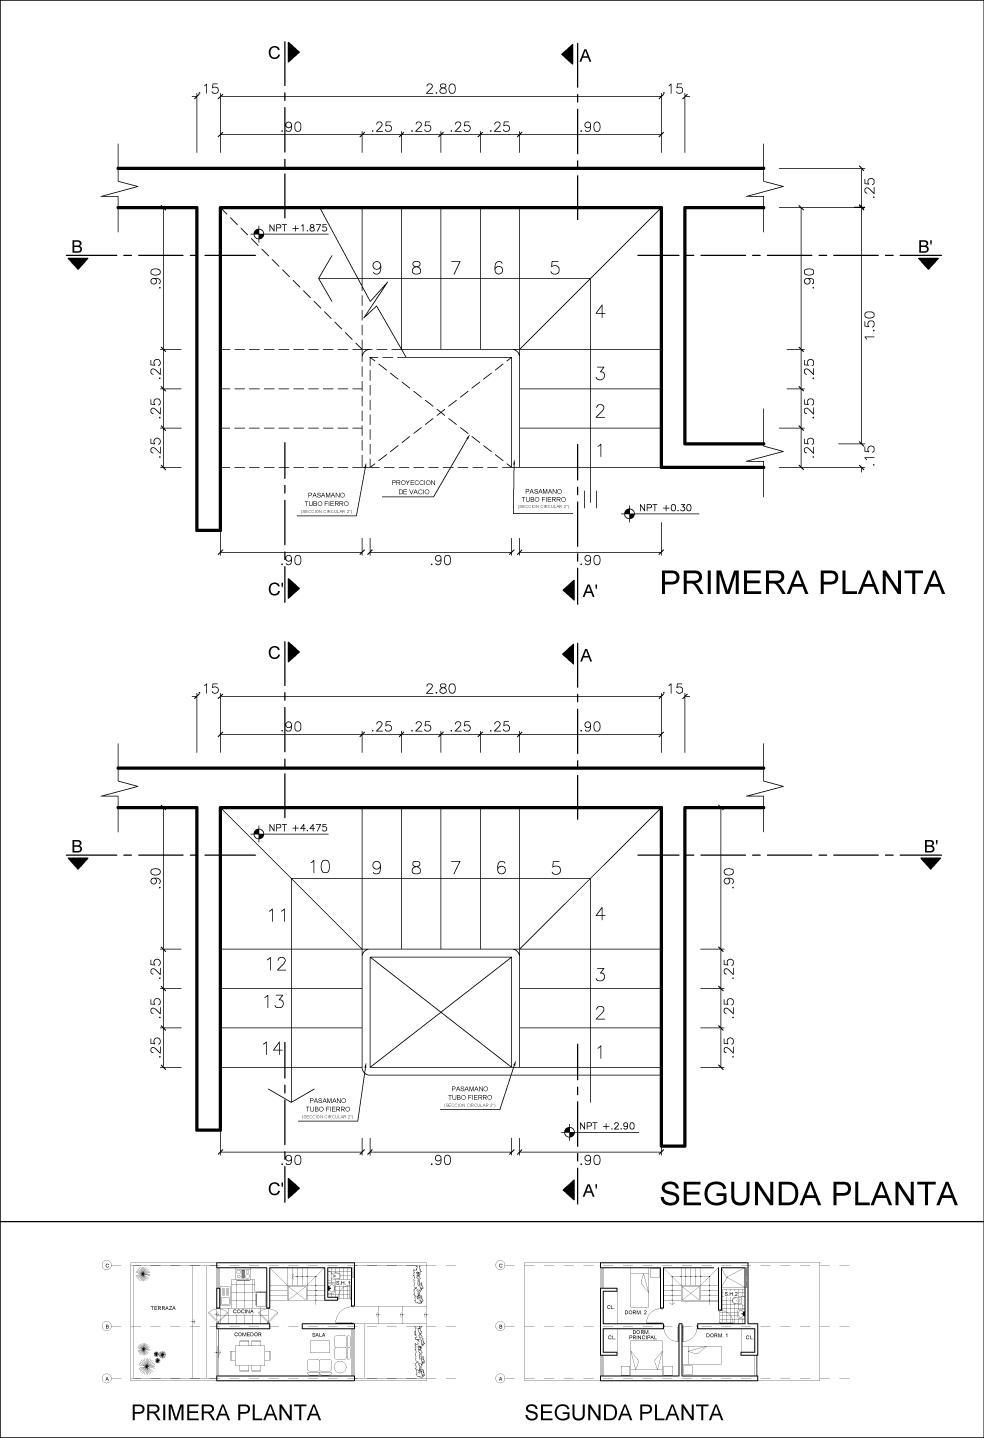 Detalle constructivo de una escalera eduardo iberico for Planos de escaleras de concreto armado